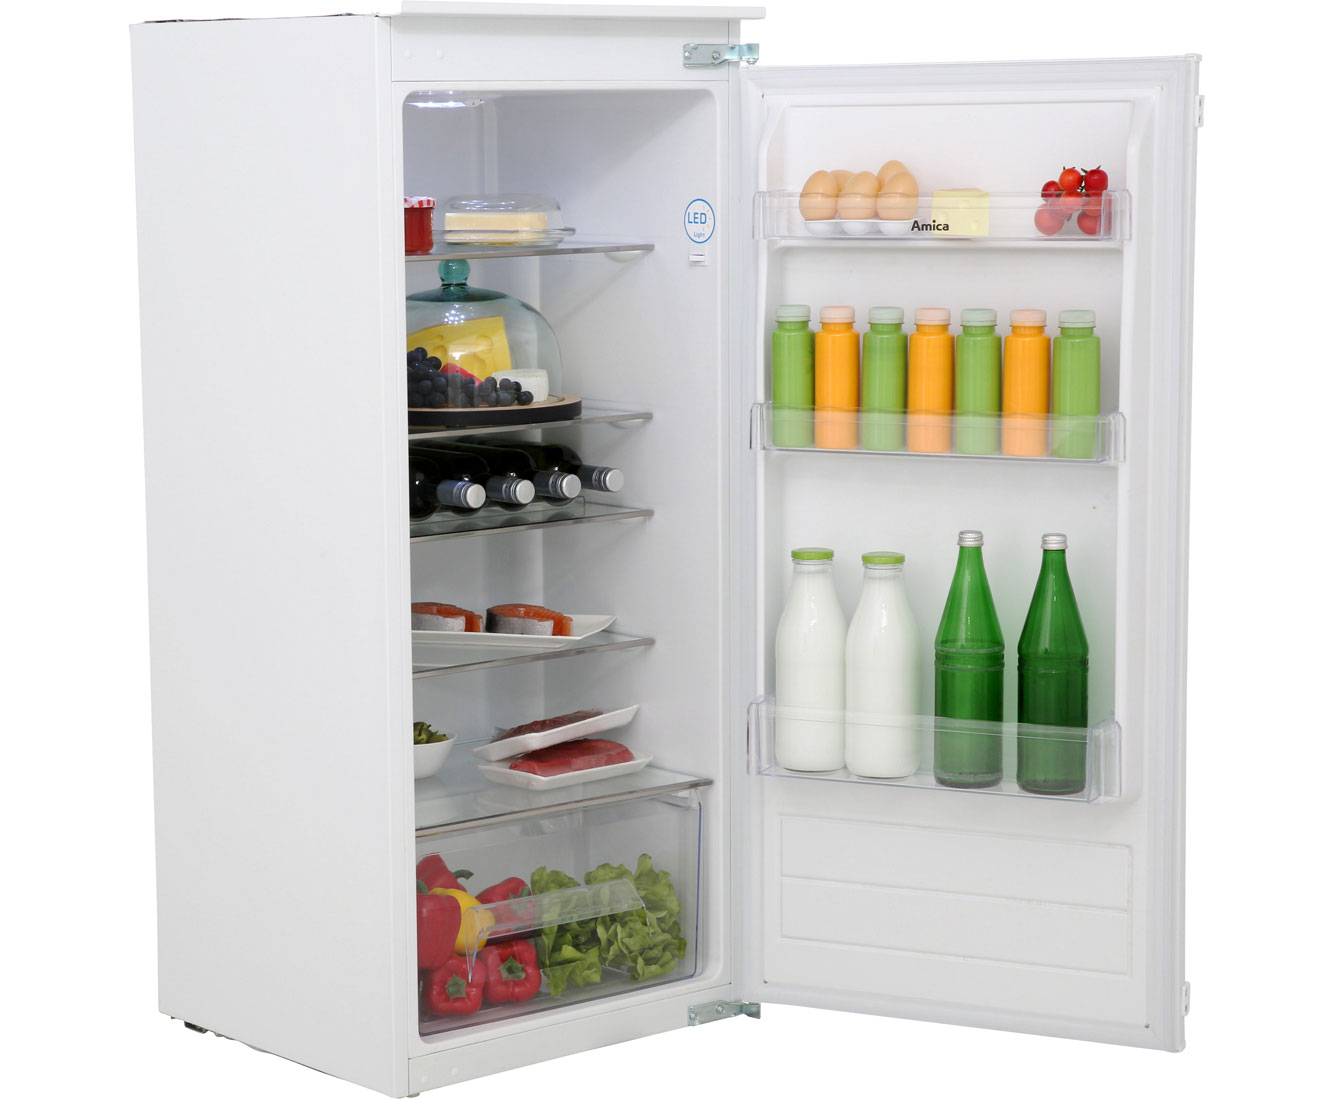 Gorenje Kühlschrank Orb153r : Rabatt preisvergleich.de haushalt u003e großgeräte u003e kühlschränke